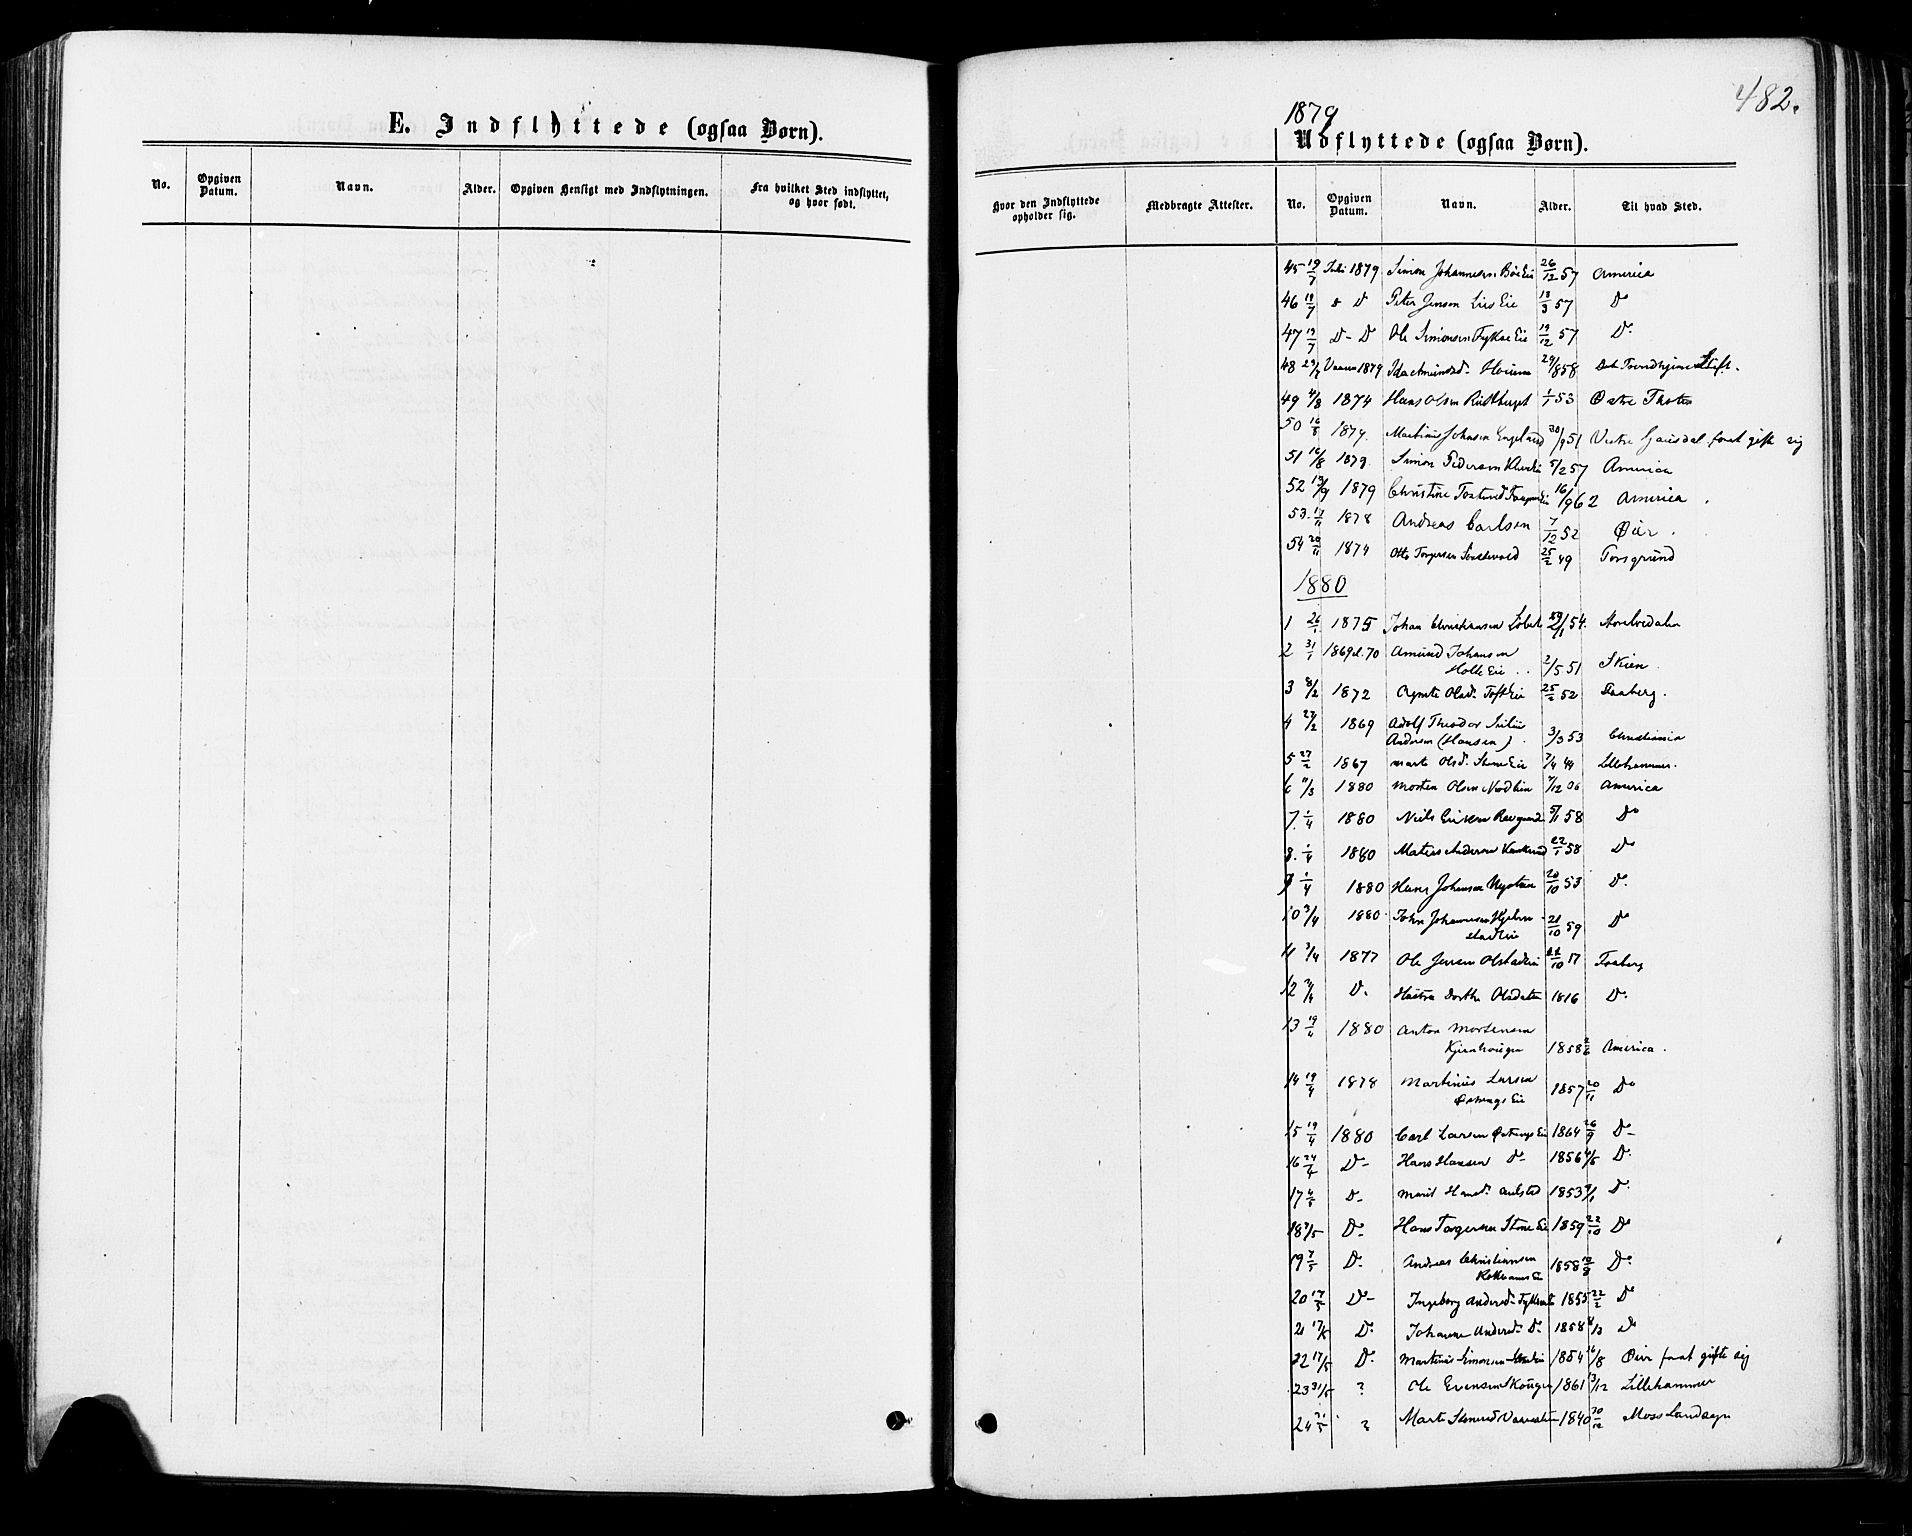 SAH, Østre Gausdal prestekontor, Ministerialbok nr. 1, 1874-1886, s. 482